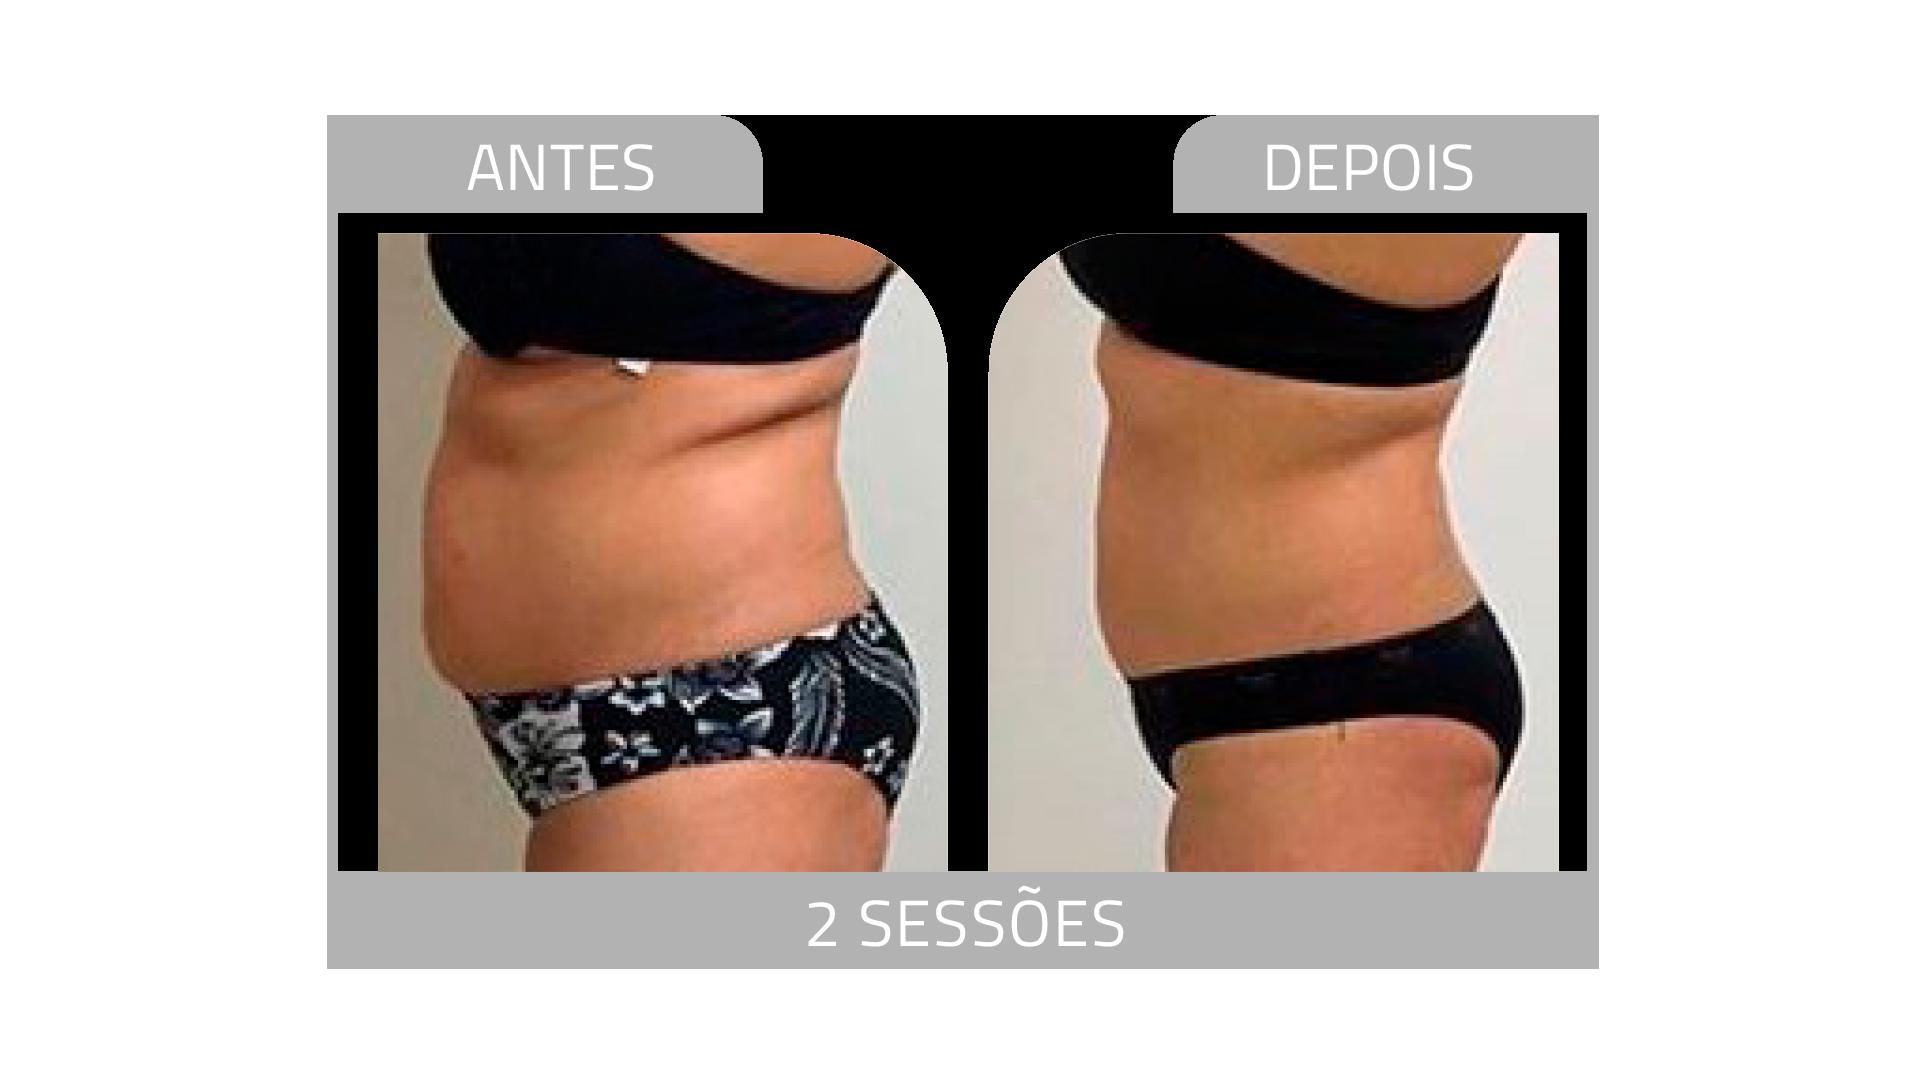 ANTES E DEPOIS LG 11.png